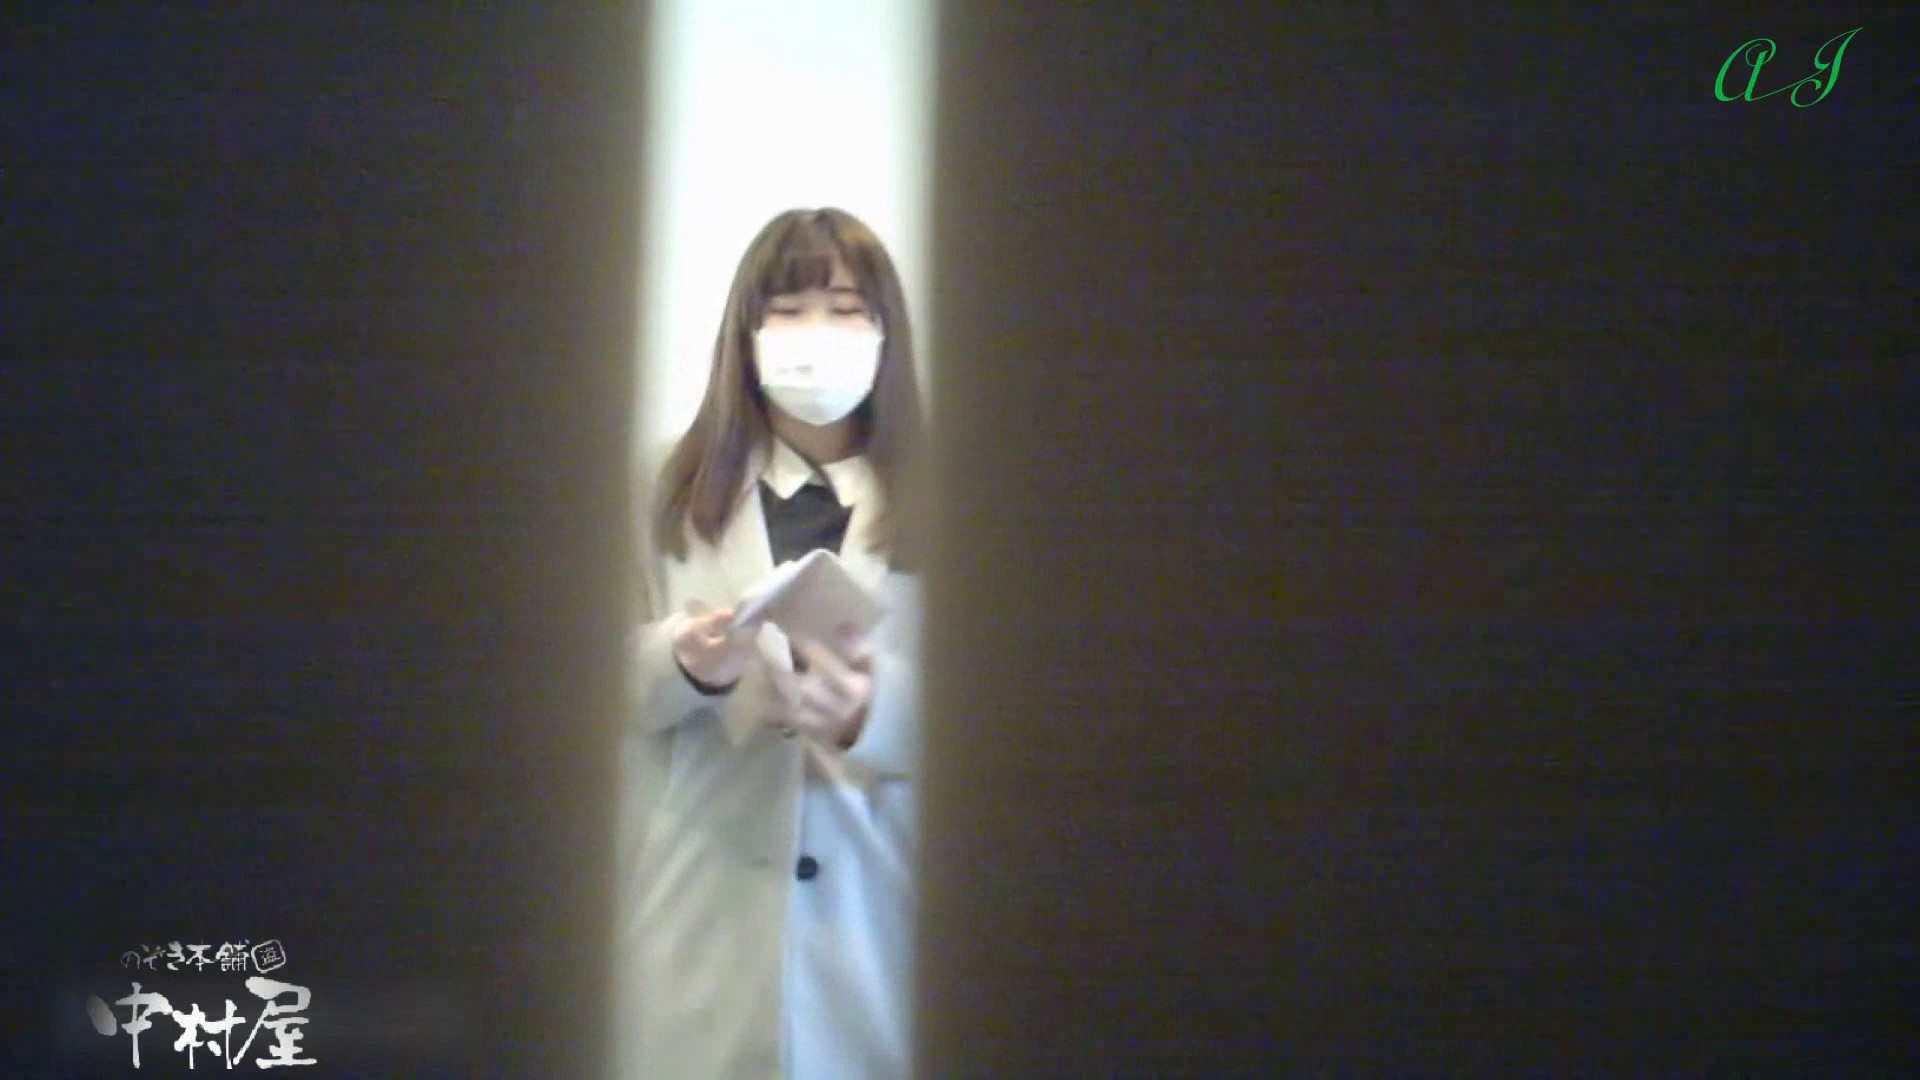 有名大学女性洗面所 vol.84後編 潜入 おまんこ無修正動画無料 93連発 10